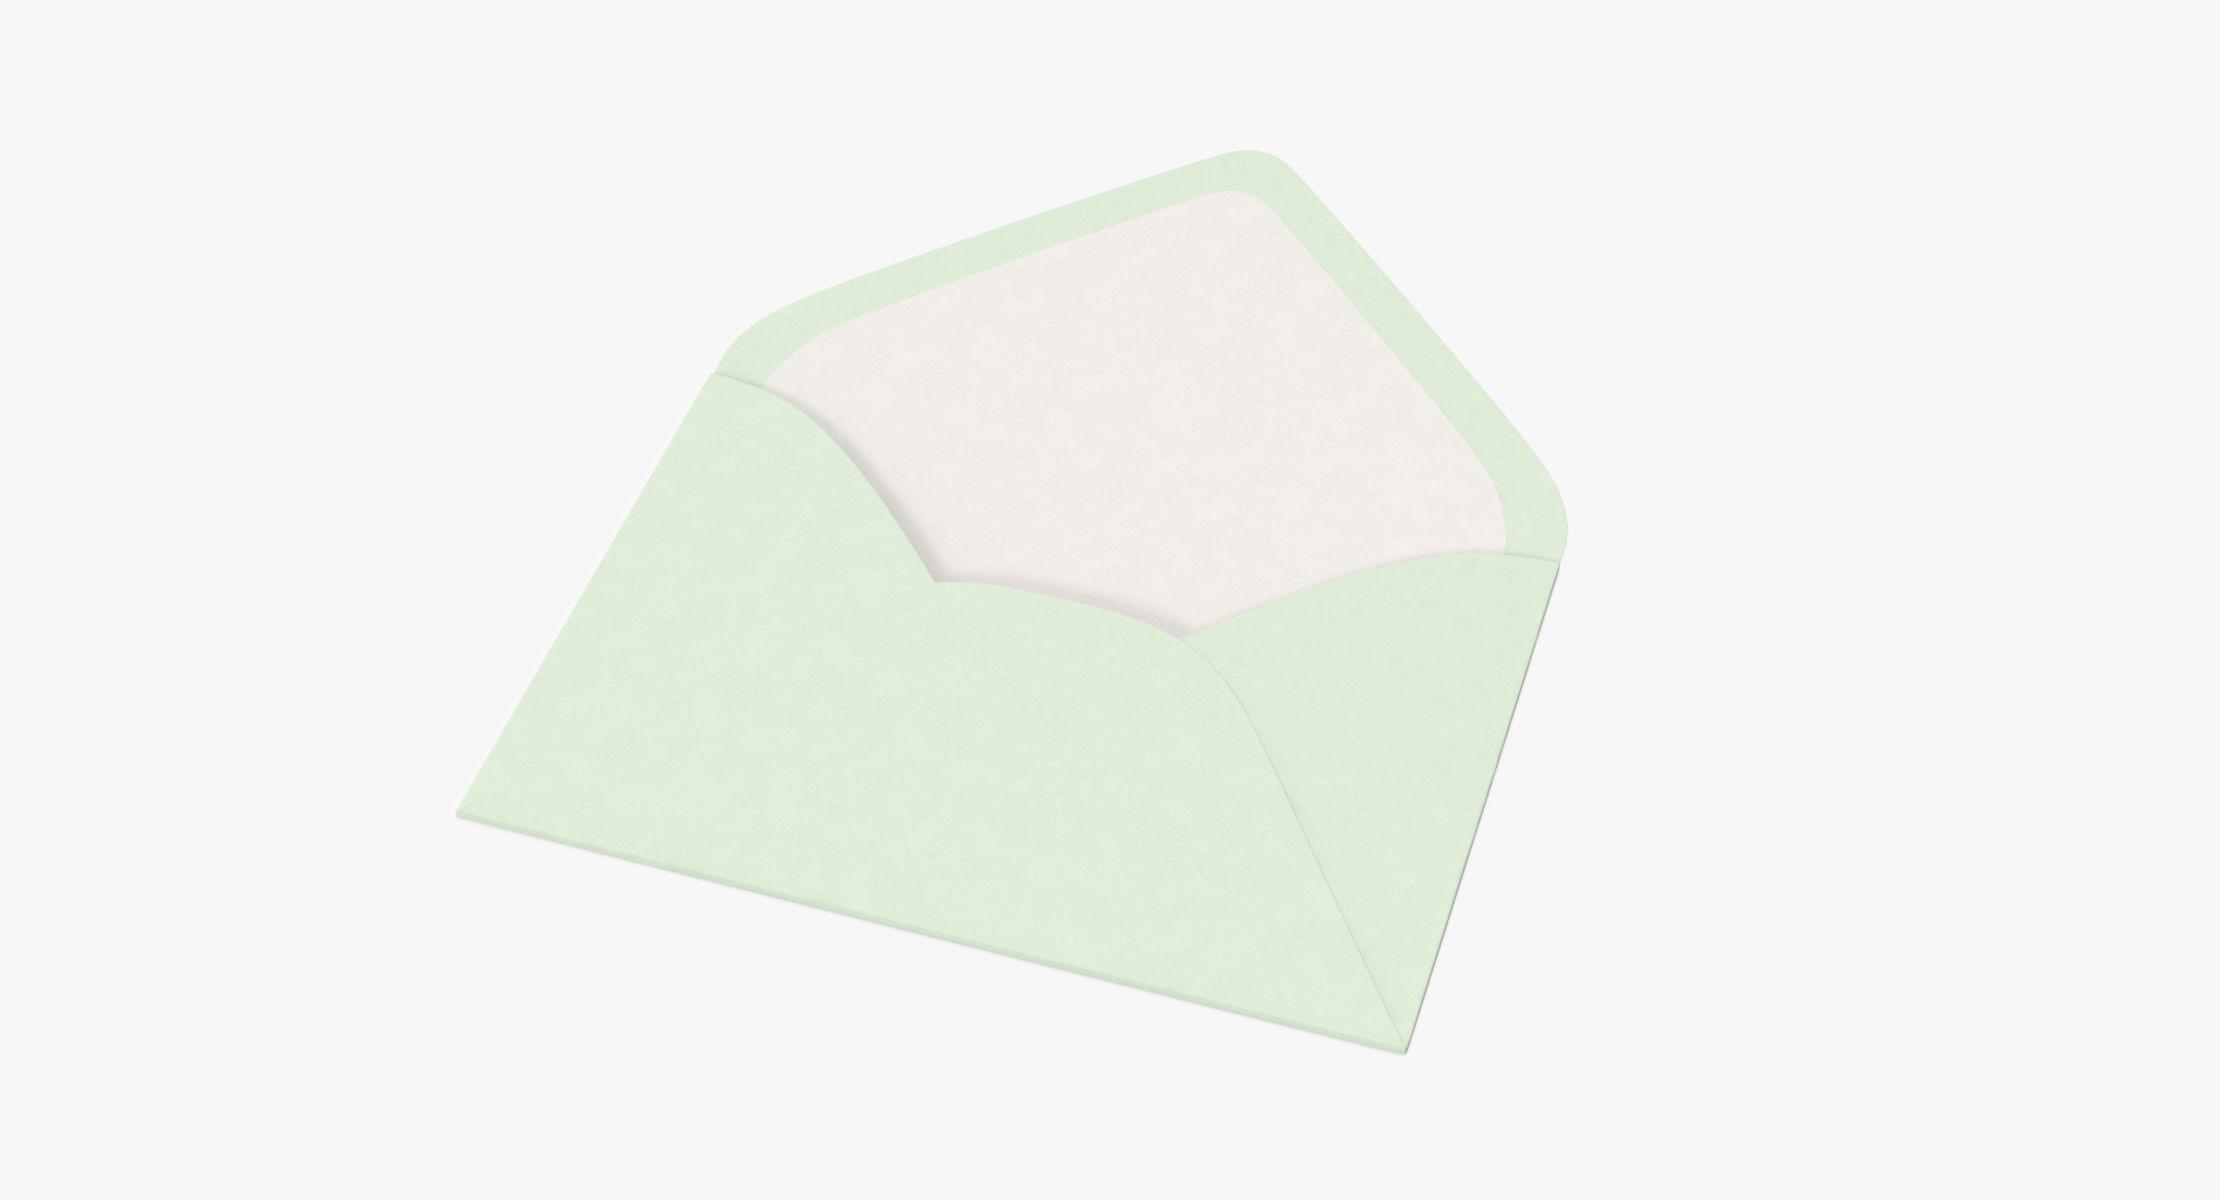 Baby Shower Envelope Open - Green - reel 1